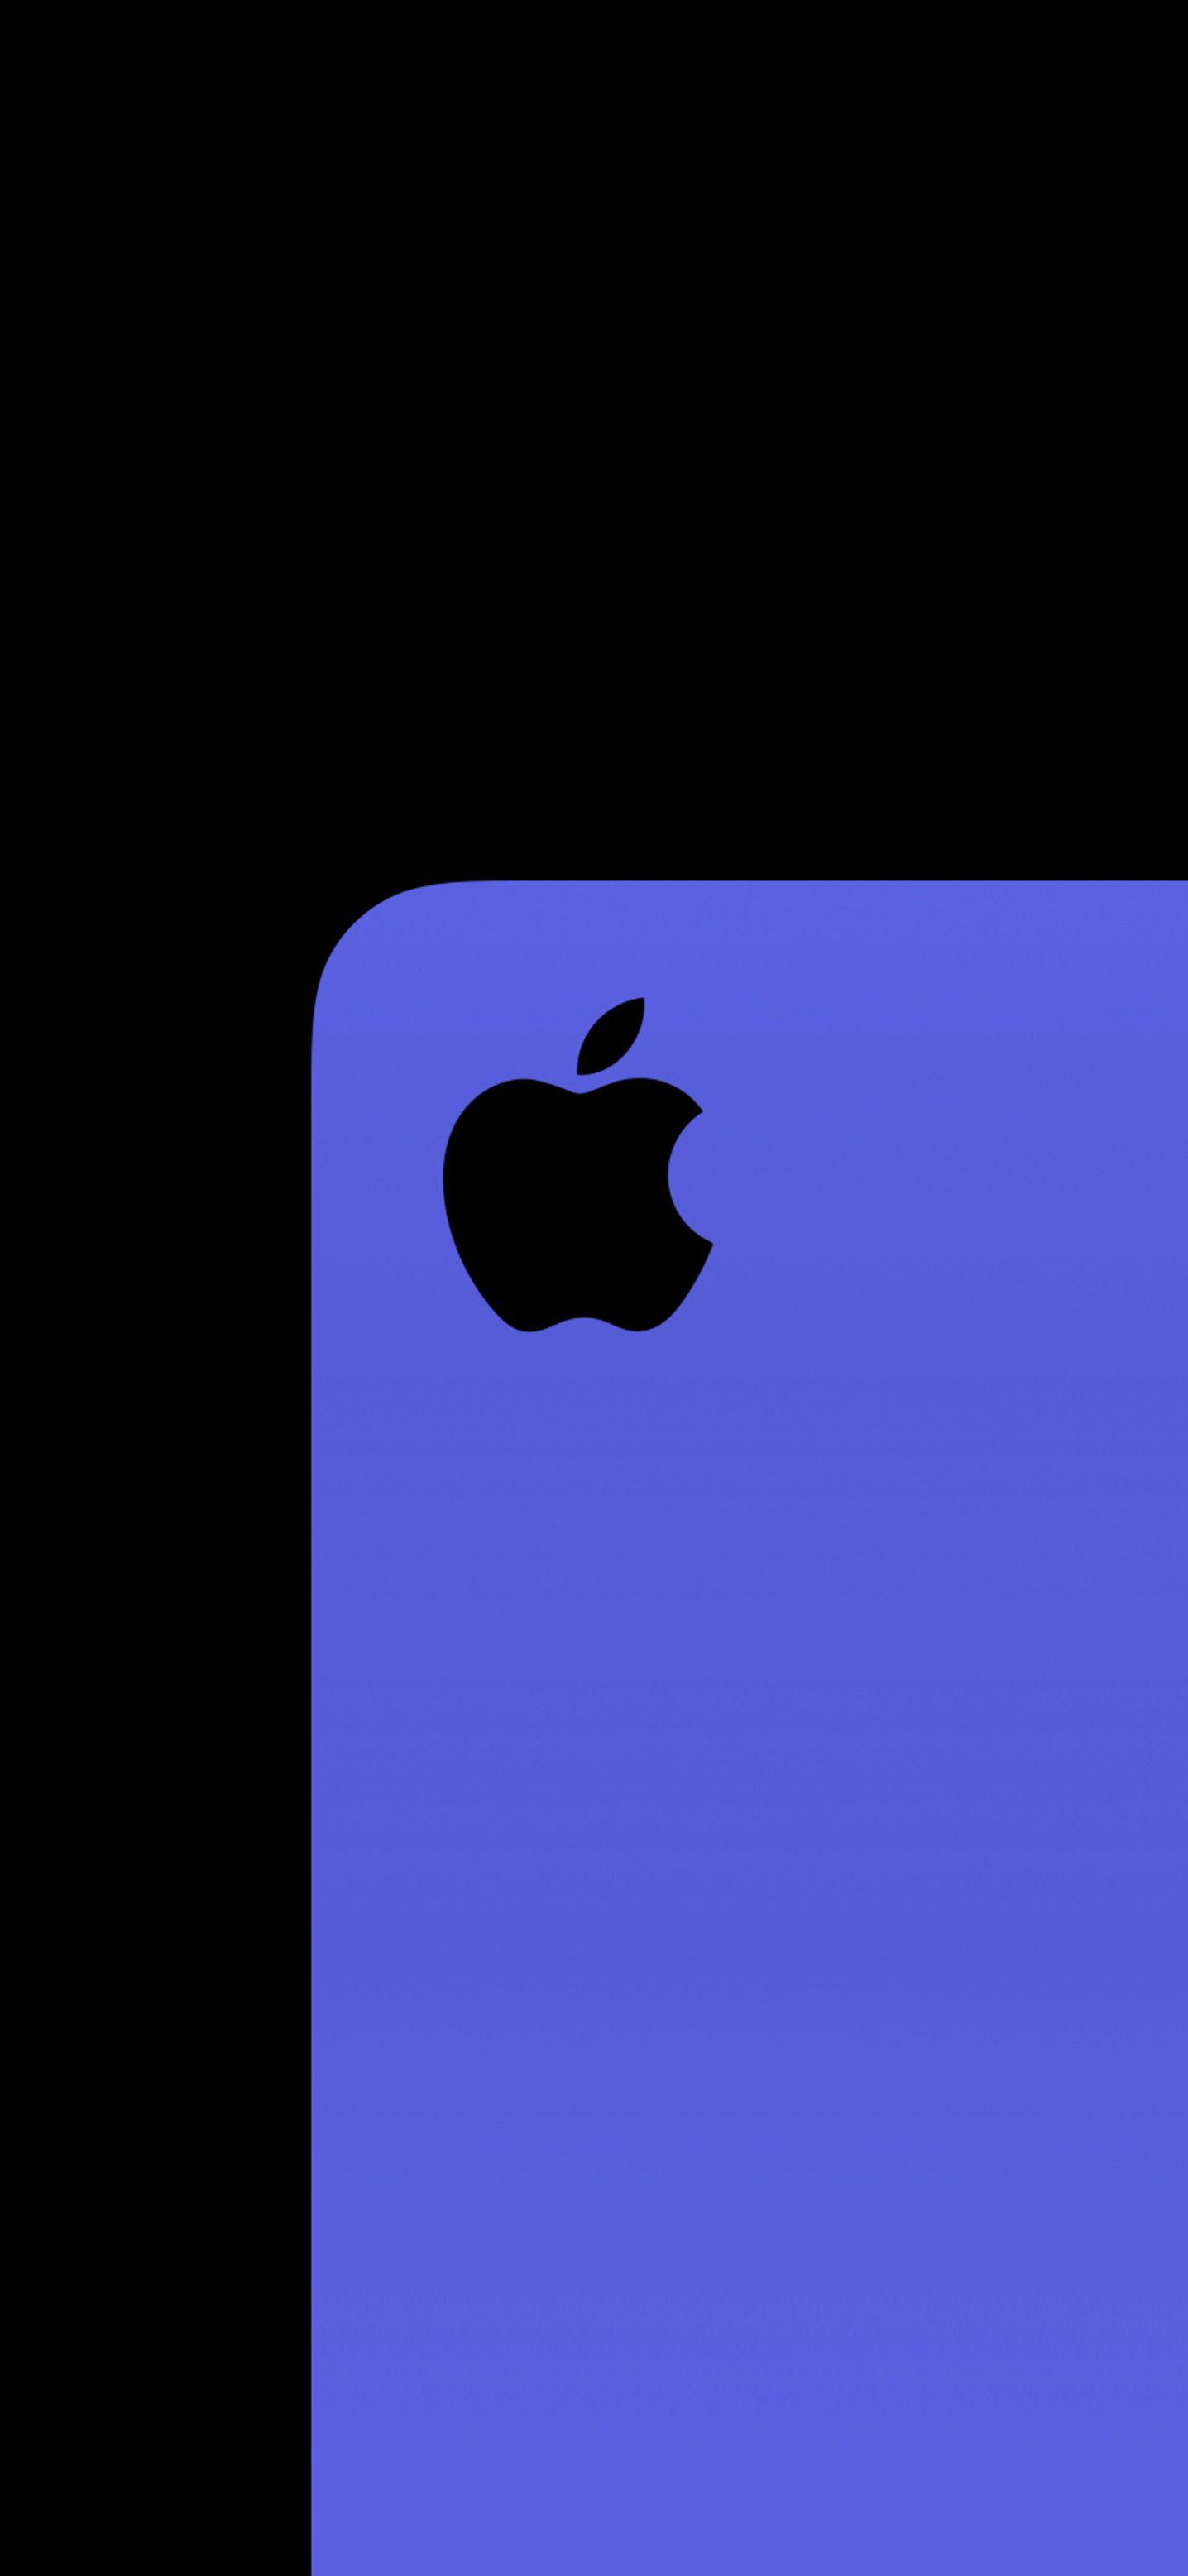 Apple Logo Blue Apple Iphone Wallpaper Hd Apple Logo Wallpaper Iphone Ipad Mini Wallpaper